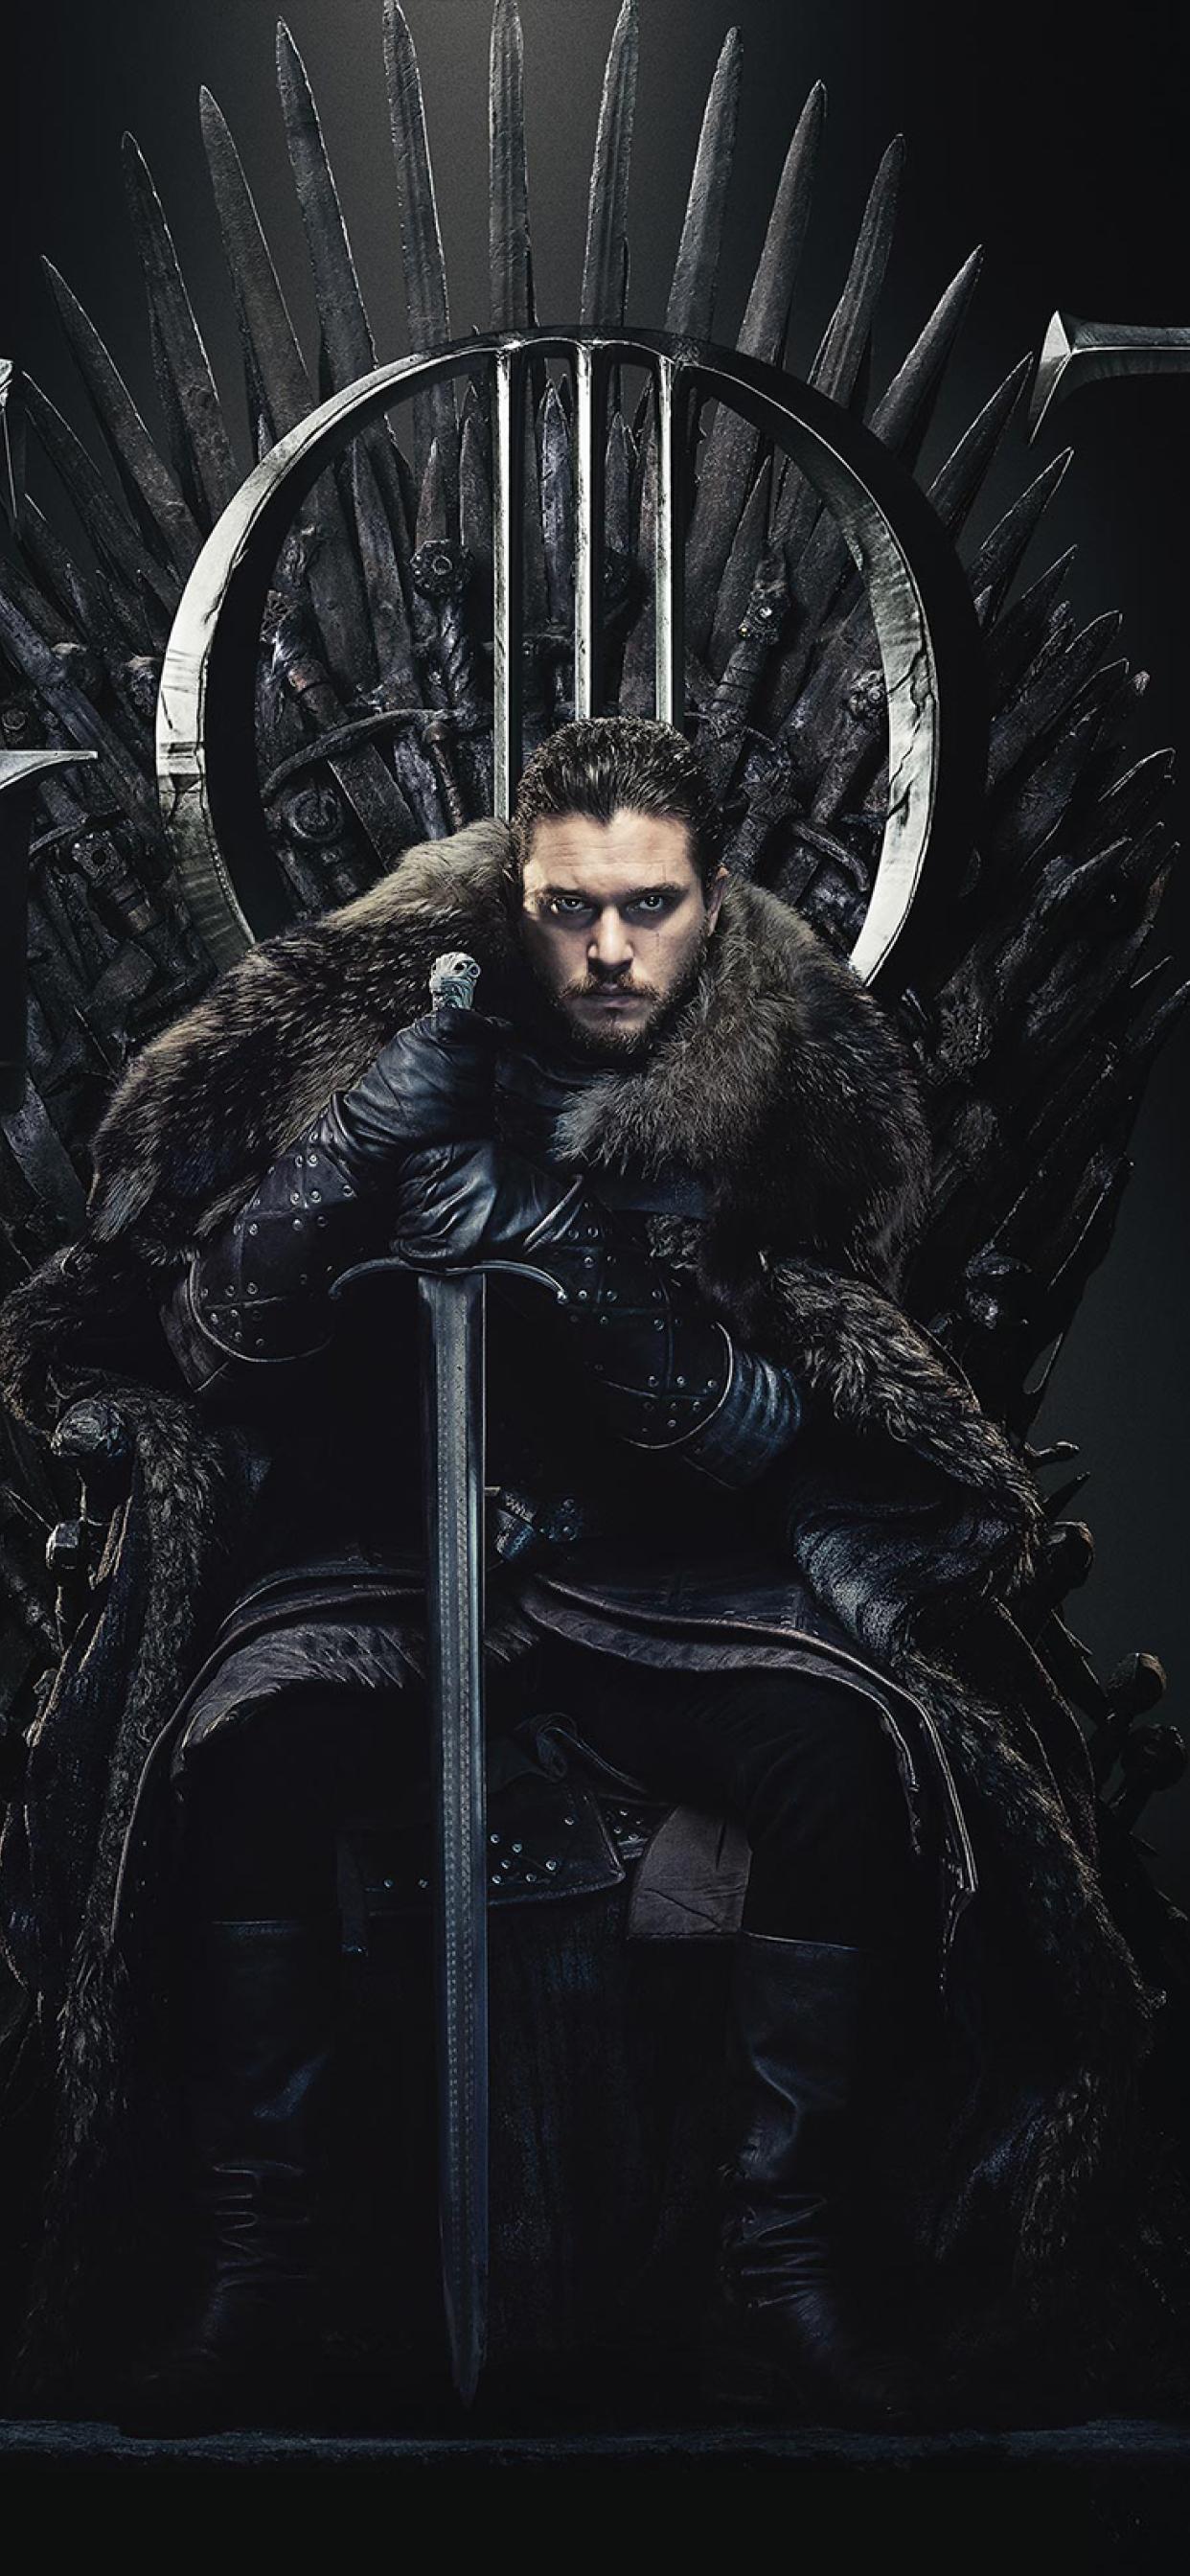 1242x2688 Jon Snow Game Of Thrones Season 8 Poster Iphone Xs